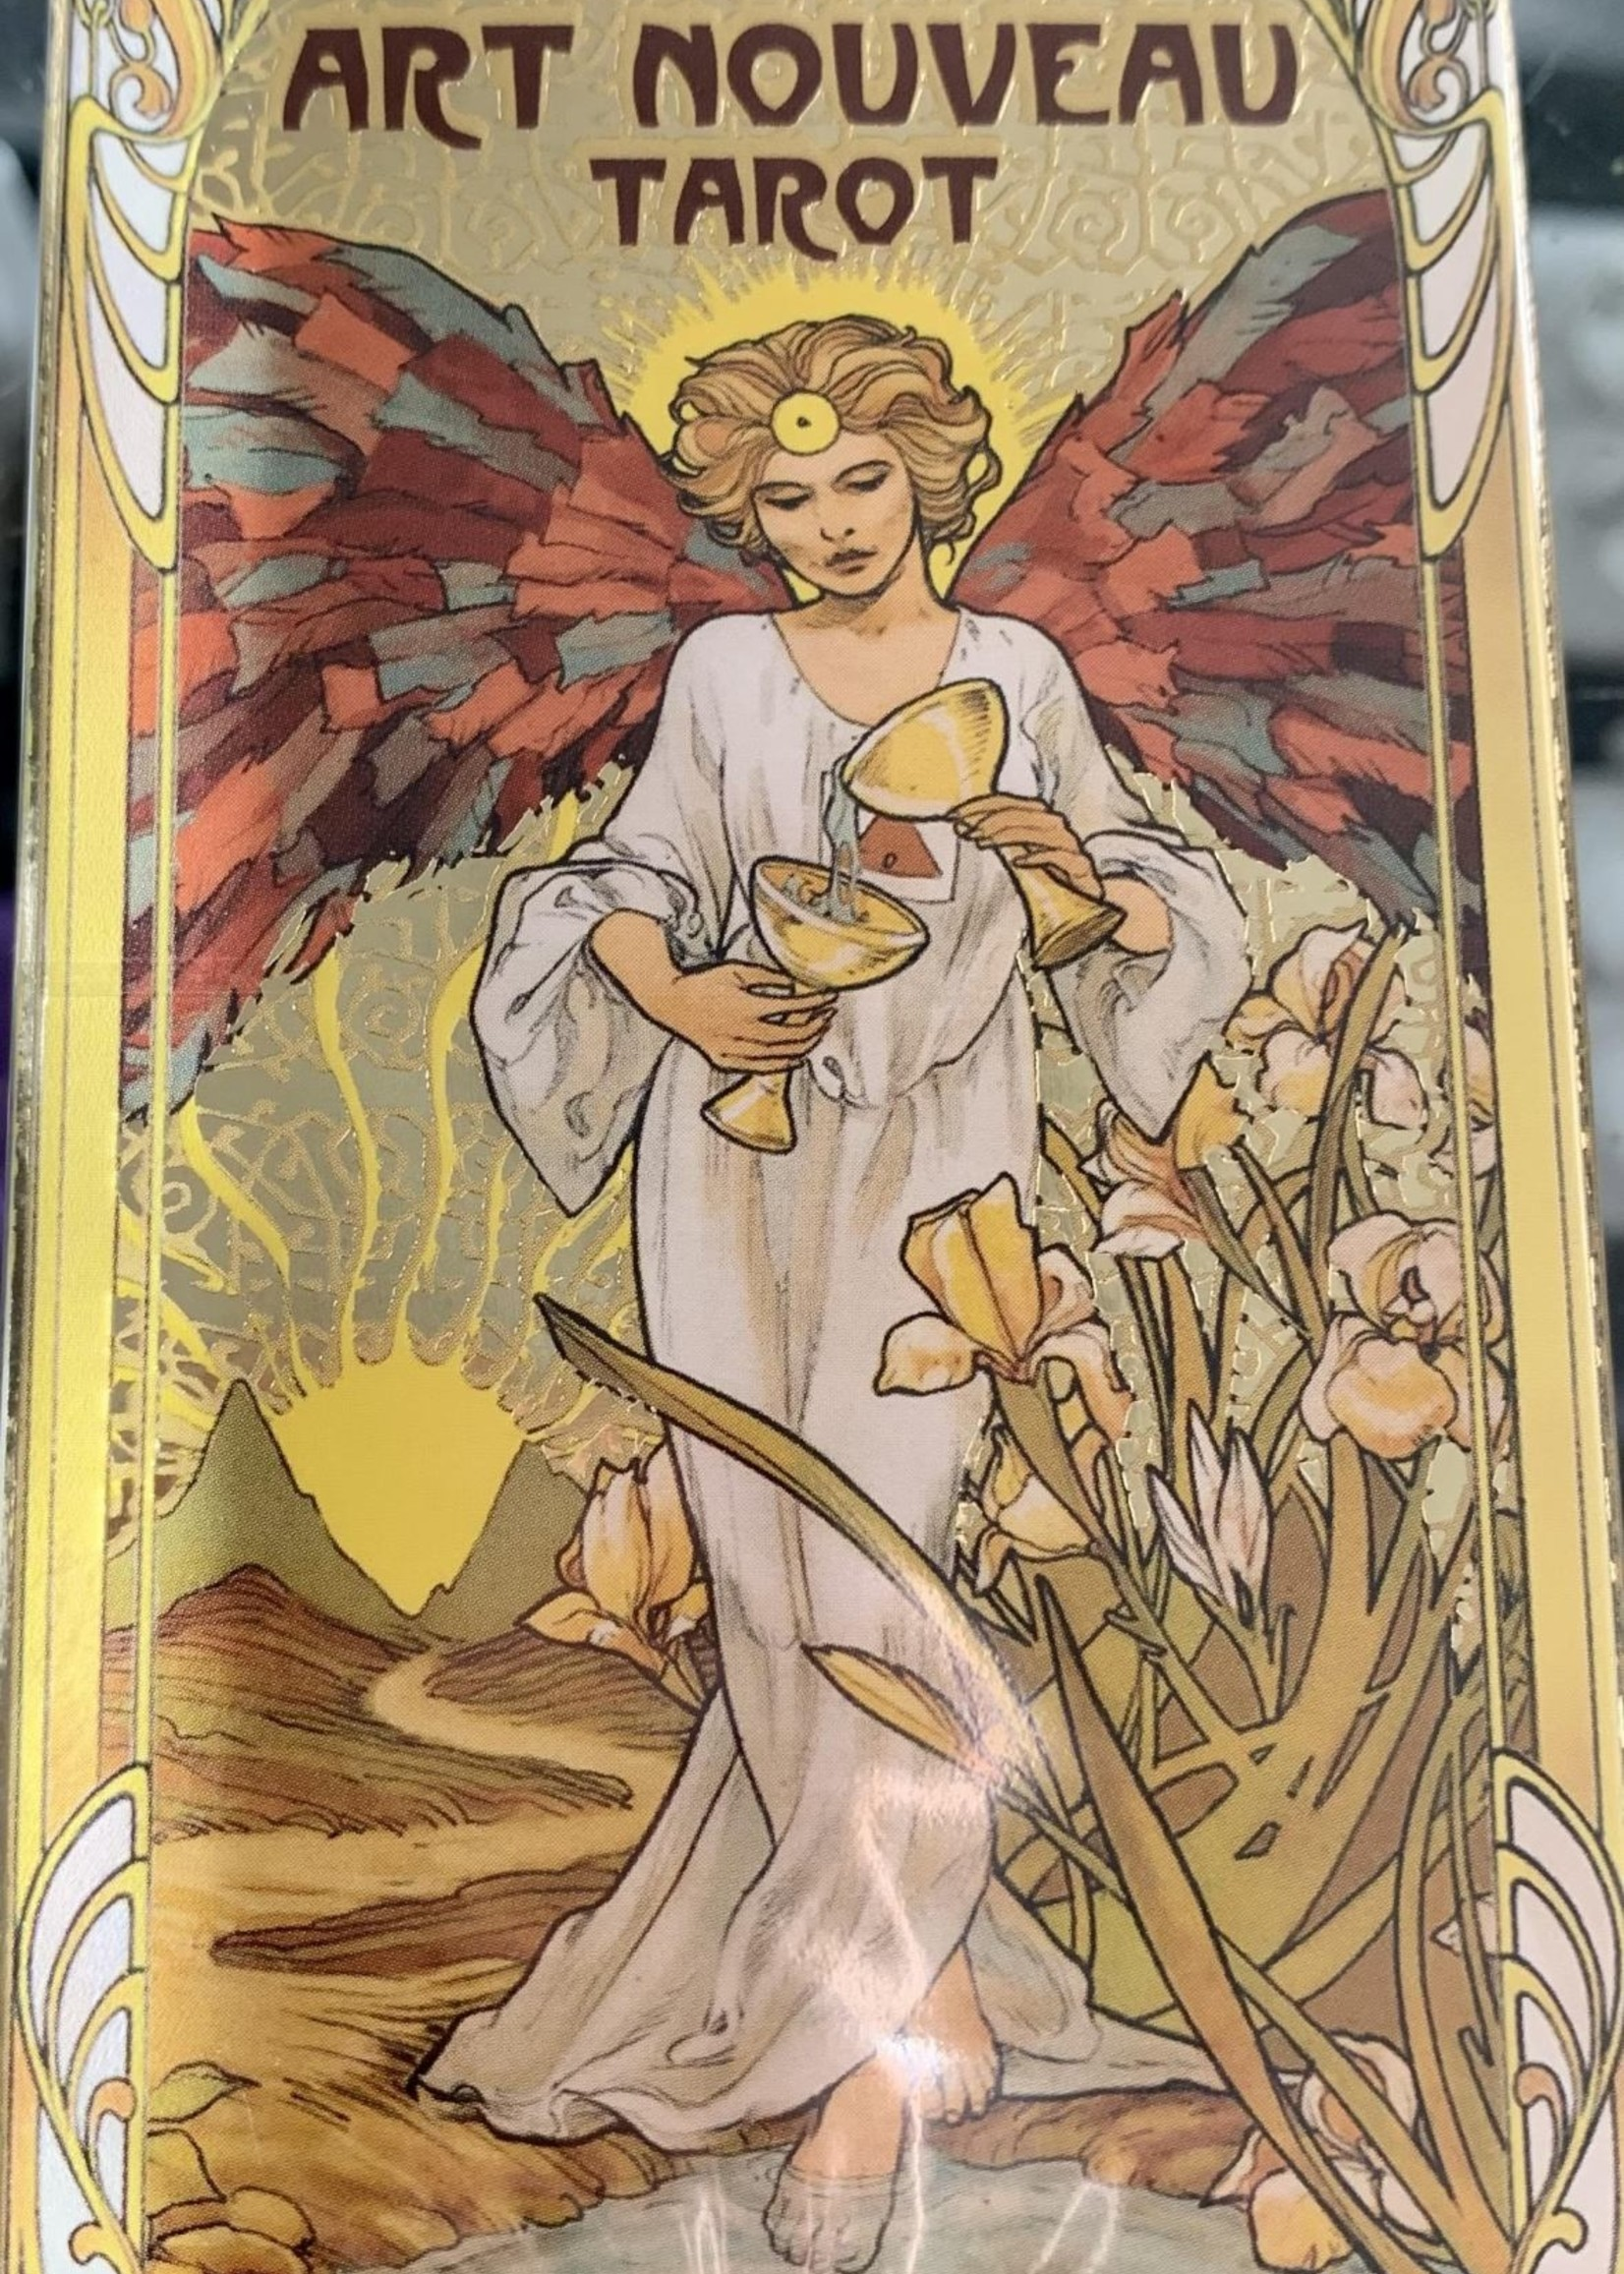 Golden Art Nouveau Tarot - BY GIULIA F. MASSAGLIA